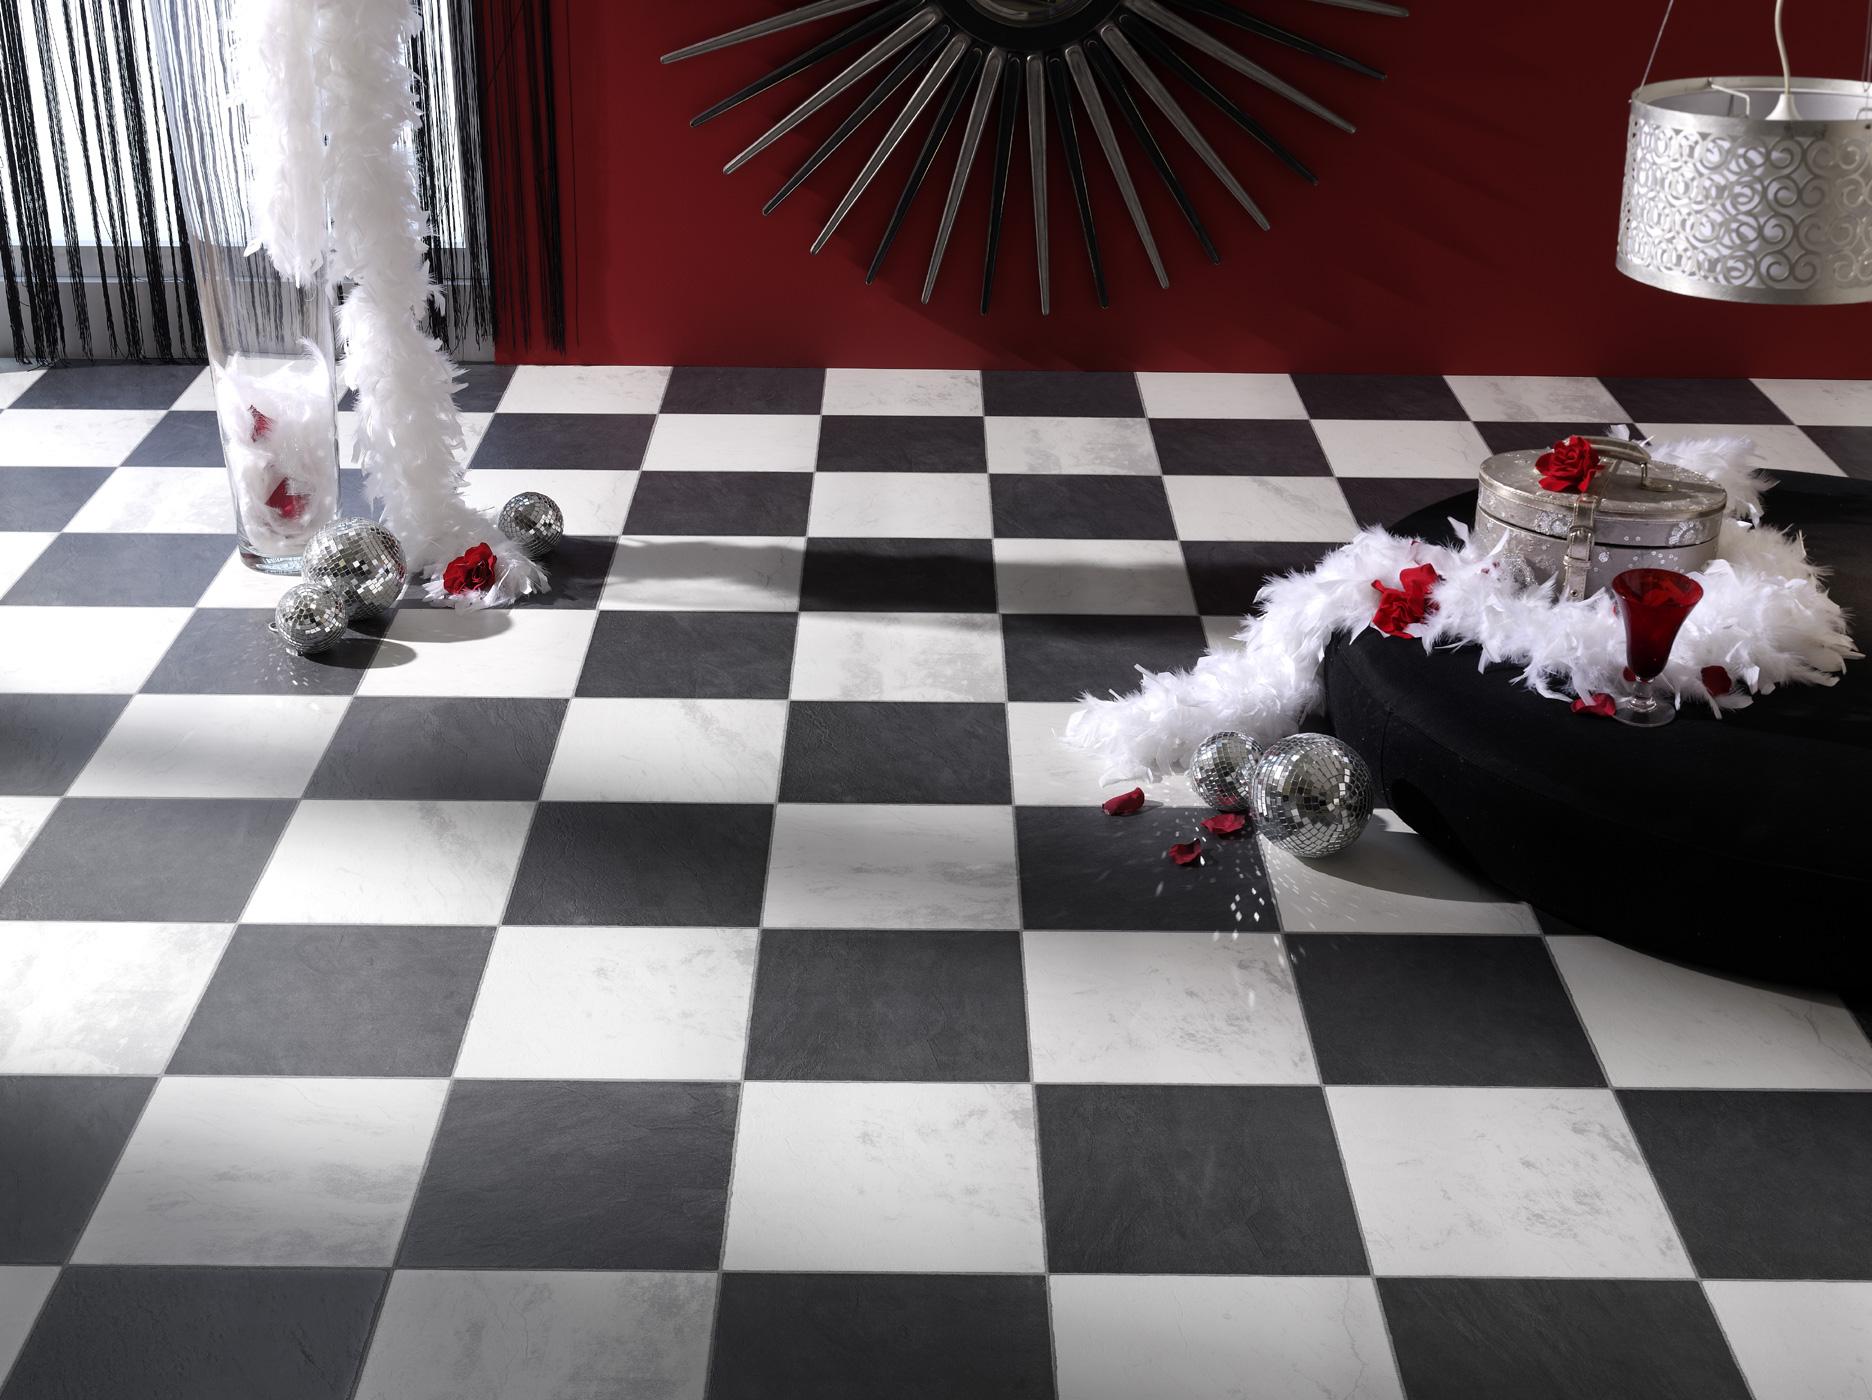 Zwart Witte Tegels : Faus laminaat tegels chess black zwart wit geblokte vloer